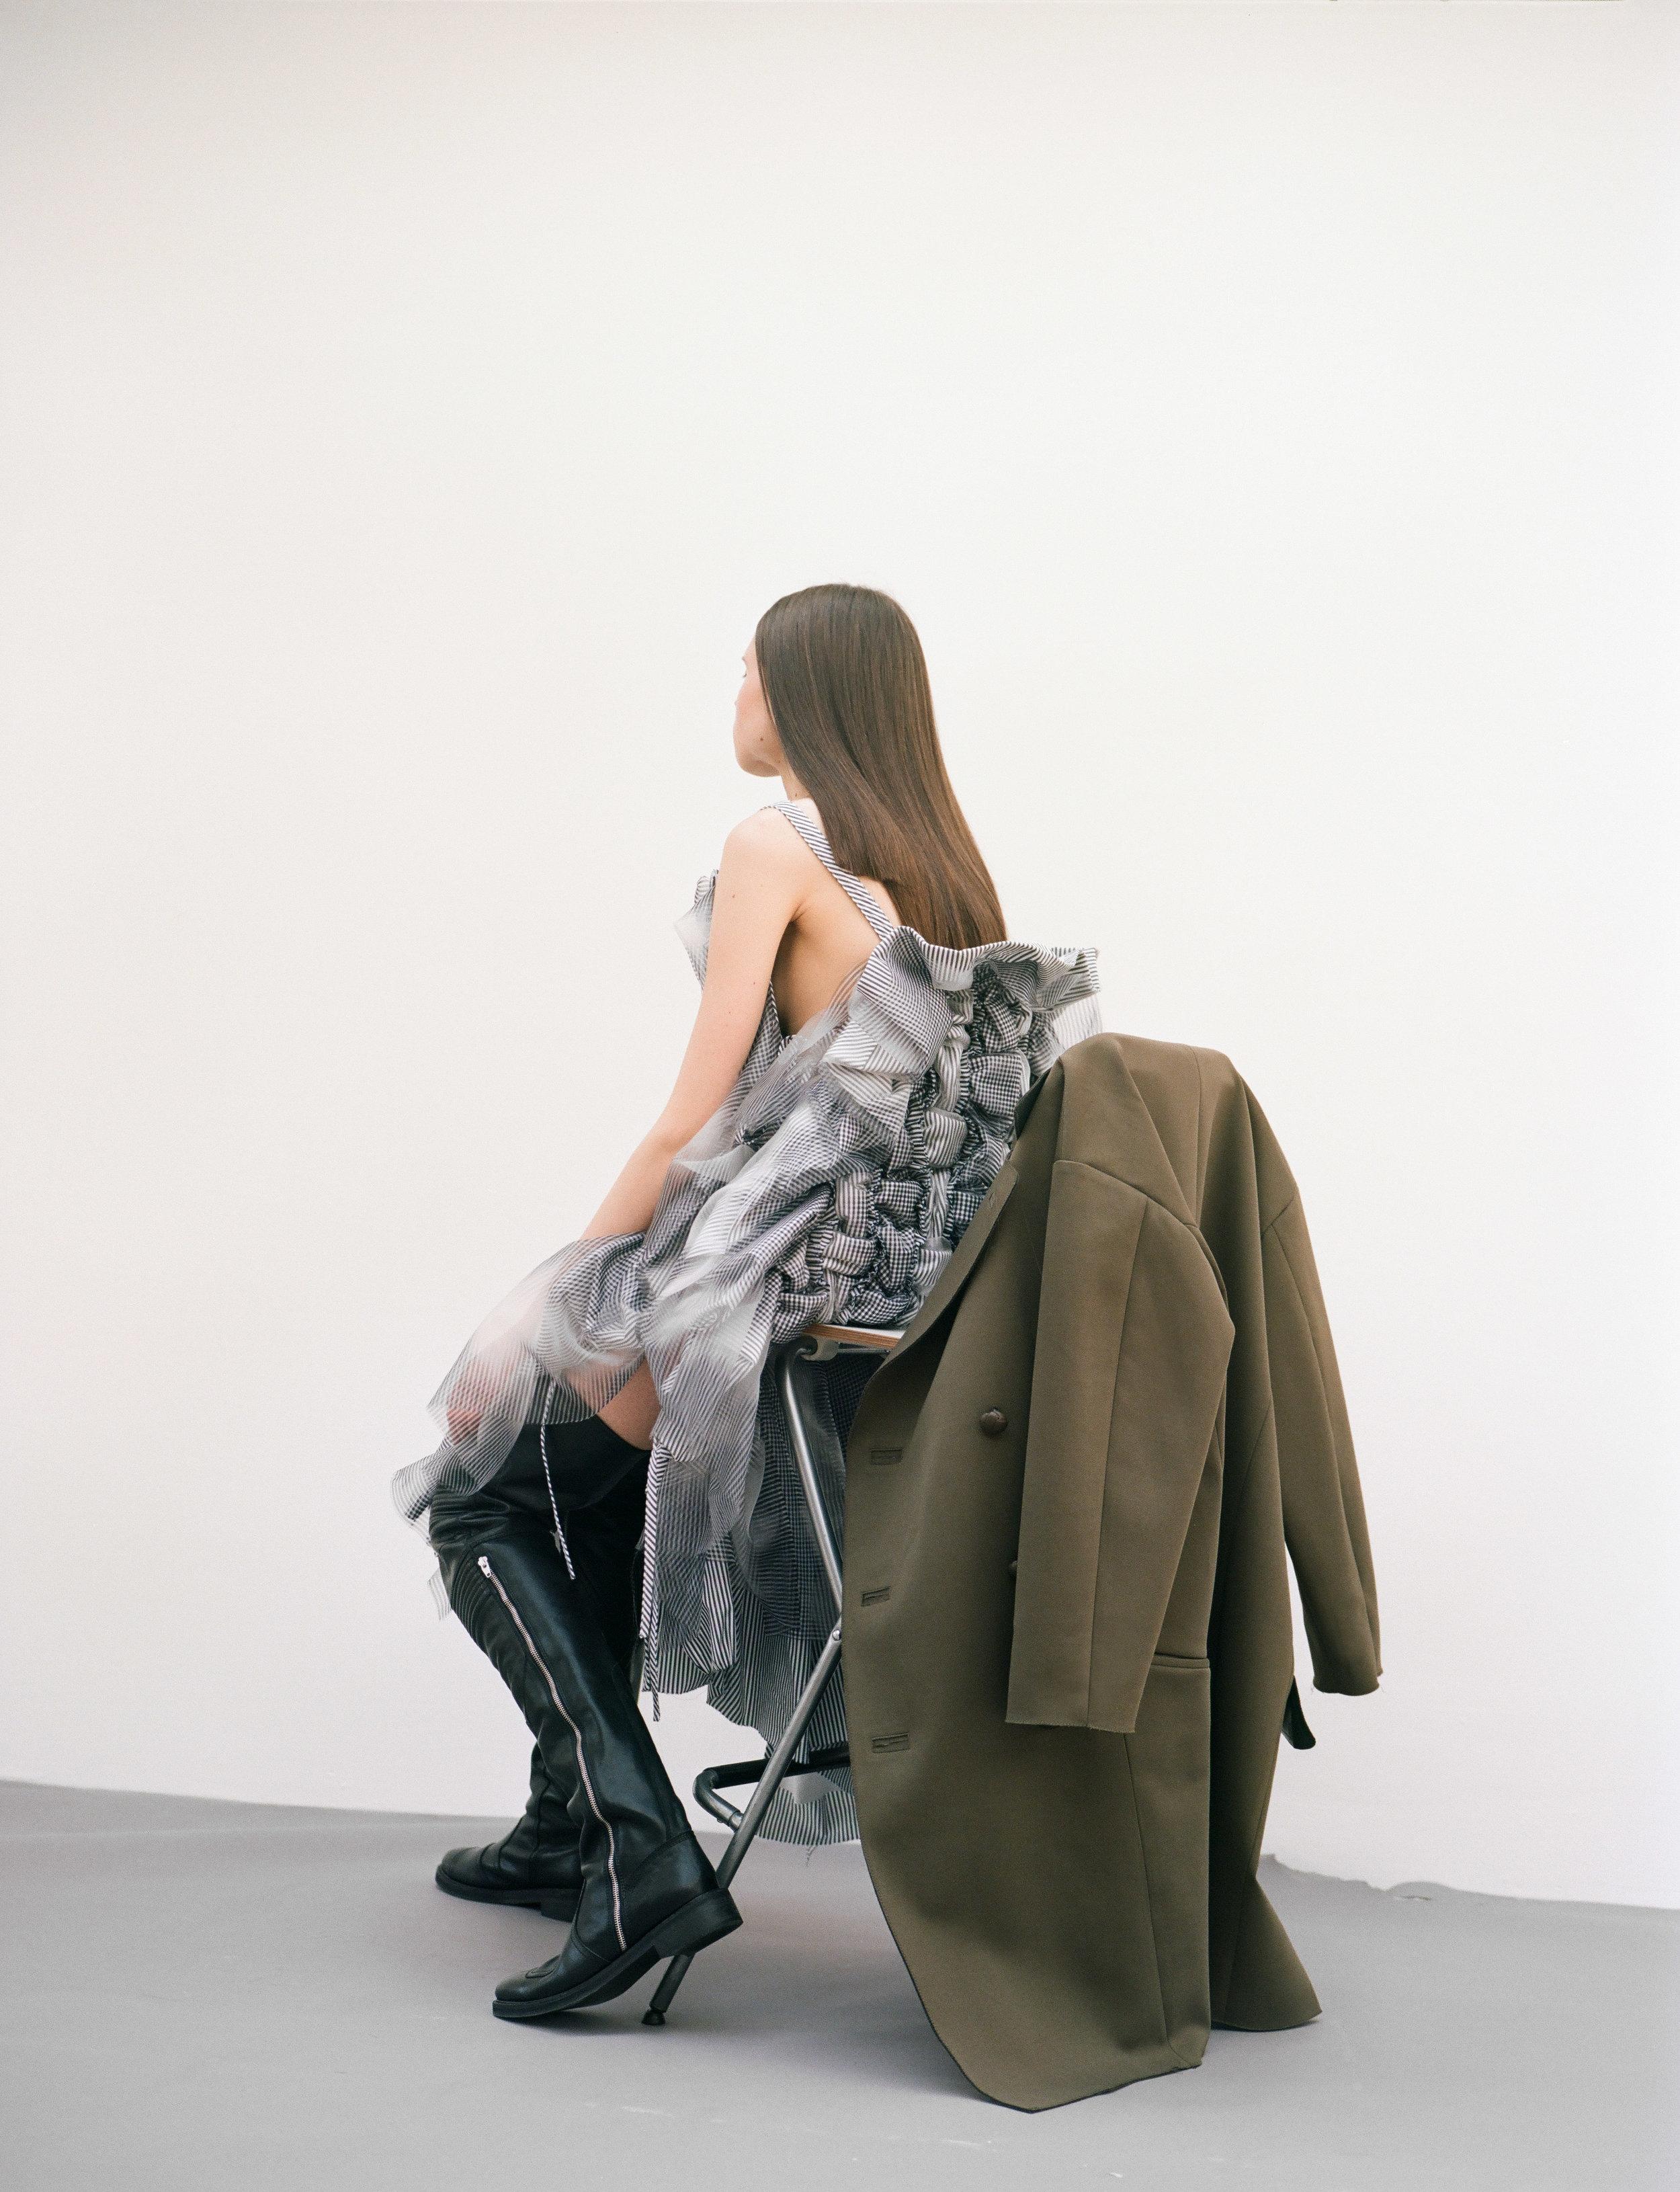 Dress  Roberts|Wood   Boots  TOGA Archives  Jacket  TOGA Pulla